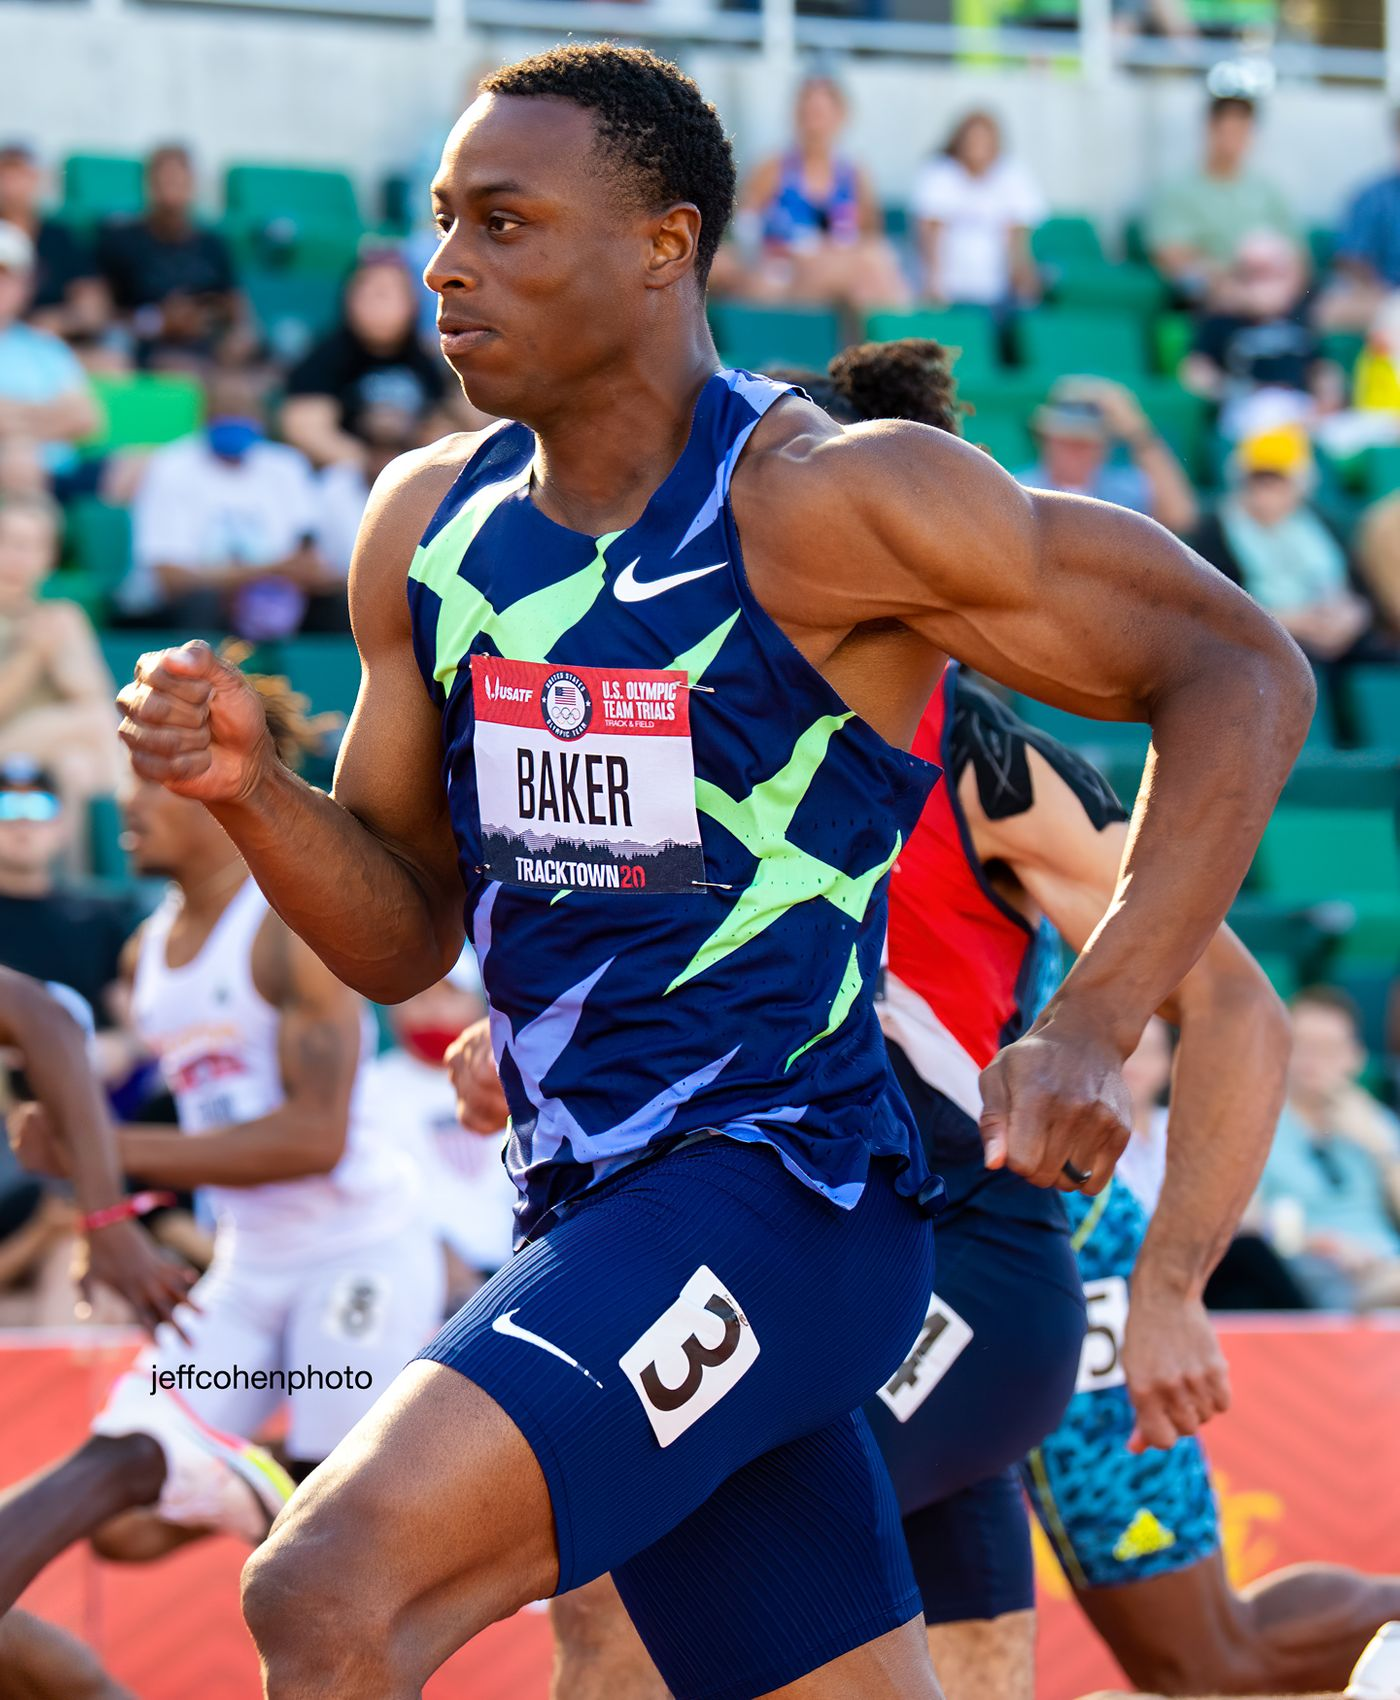 baker-100m-2021-US-Oly-Trials-day-2-1065-jeff-cohen-photo--web.jpg